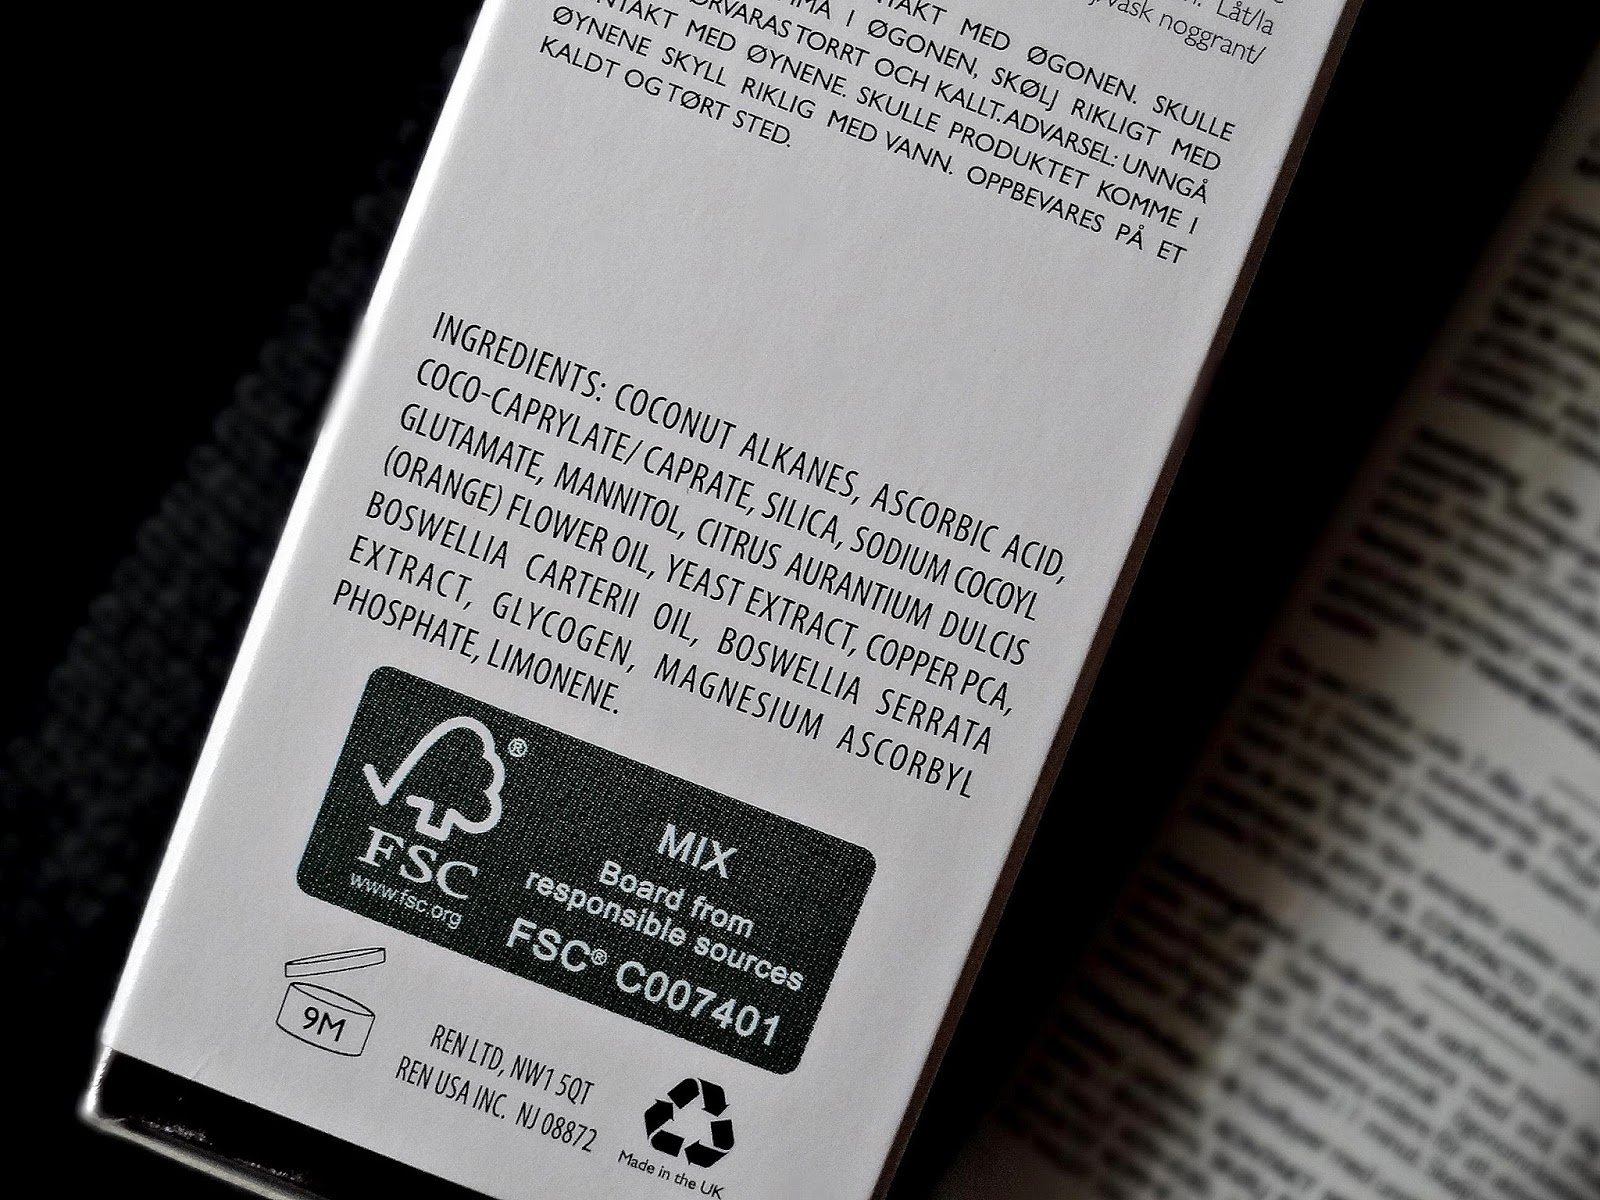 REN Flash Rinse 1 Minute Facial Ingredients